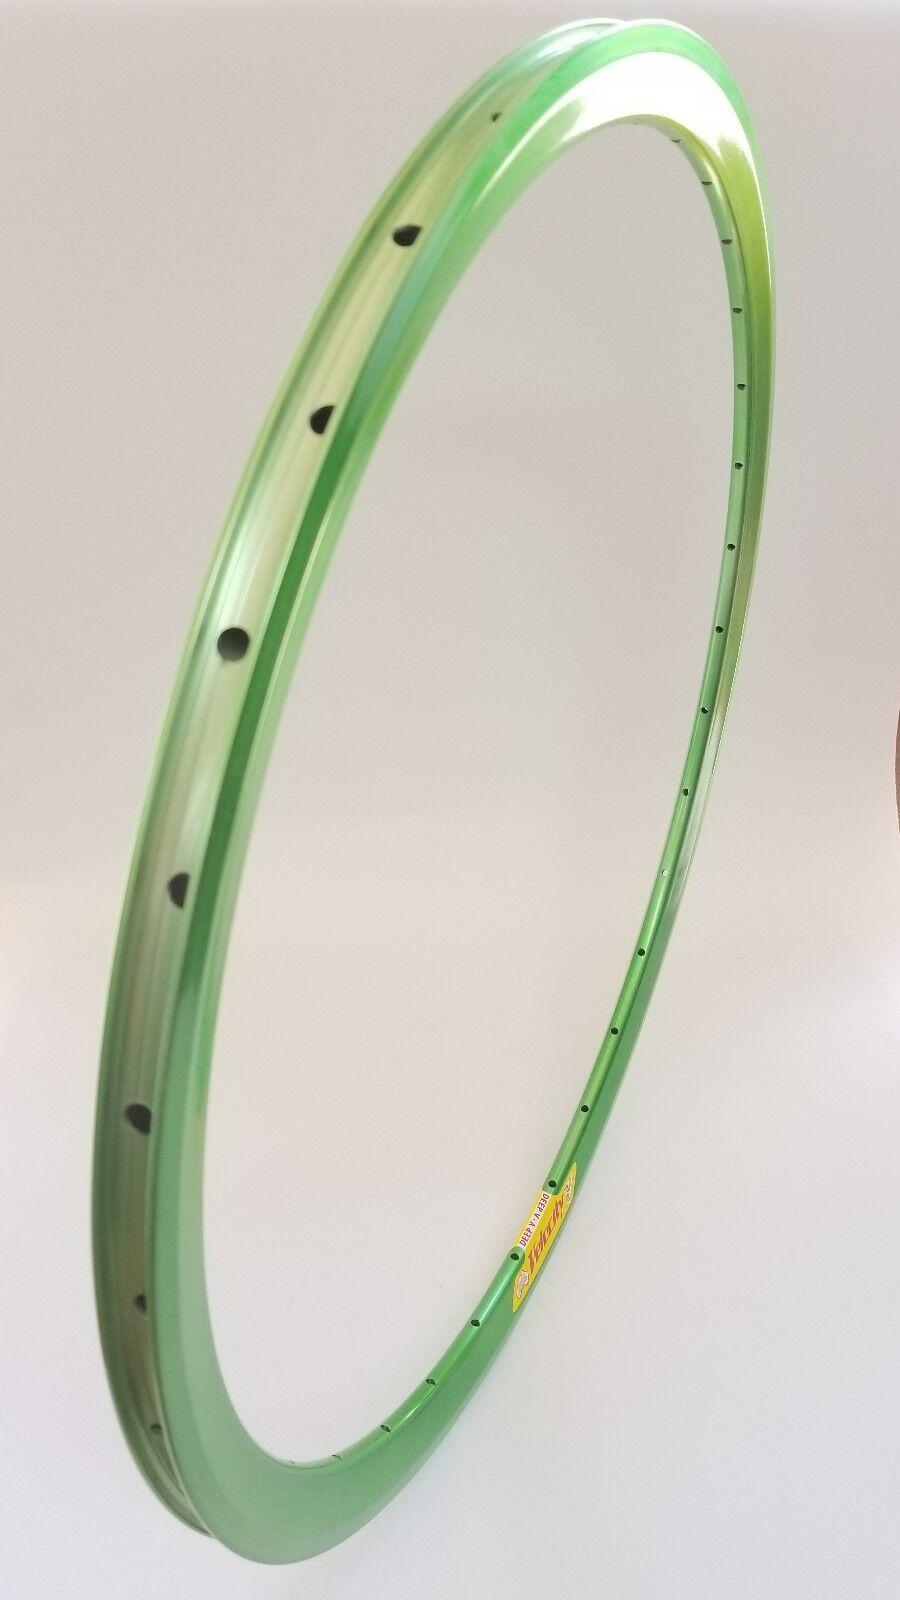 Velocity Deep V Bicycle Rim, 650C, Candy verde Powder Coat, 32 Hole